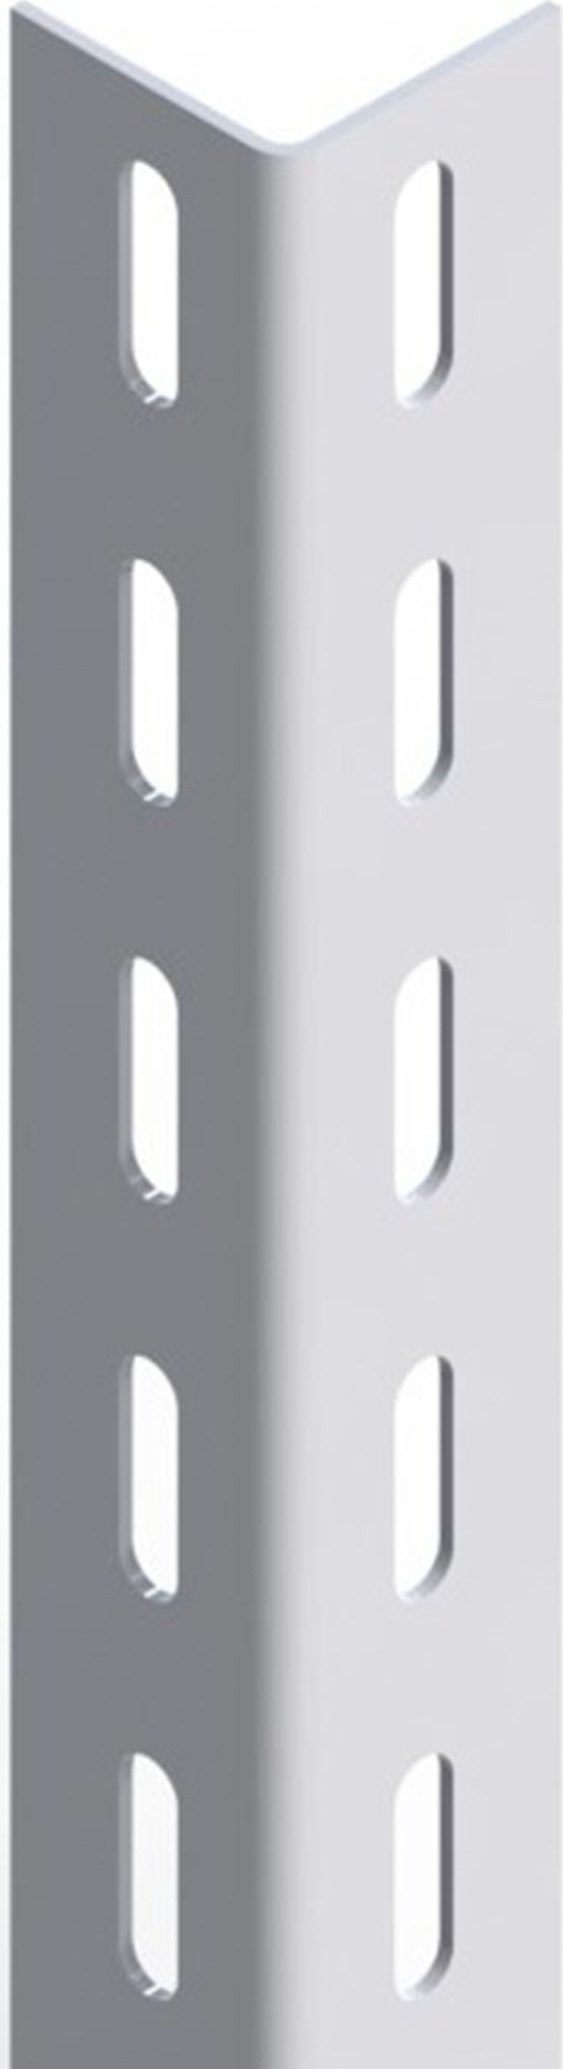 Bondi Angolare per Scaffali Scaffalature 40x40 Asole Ovali 300 cm Linea Basic